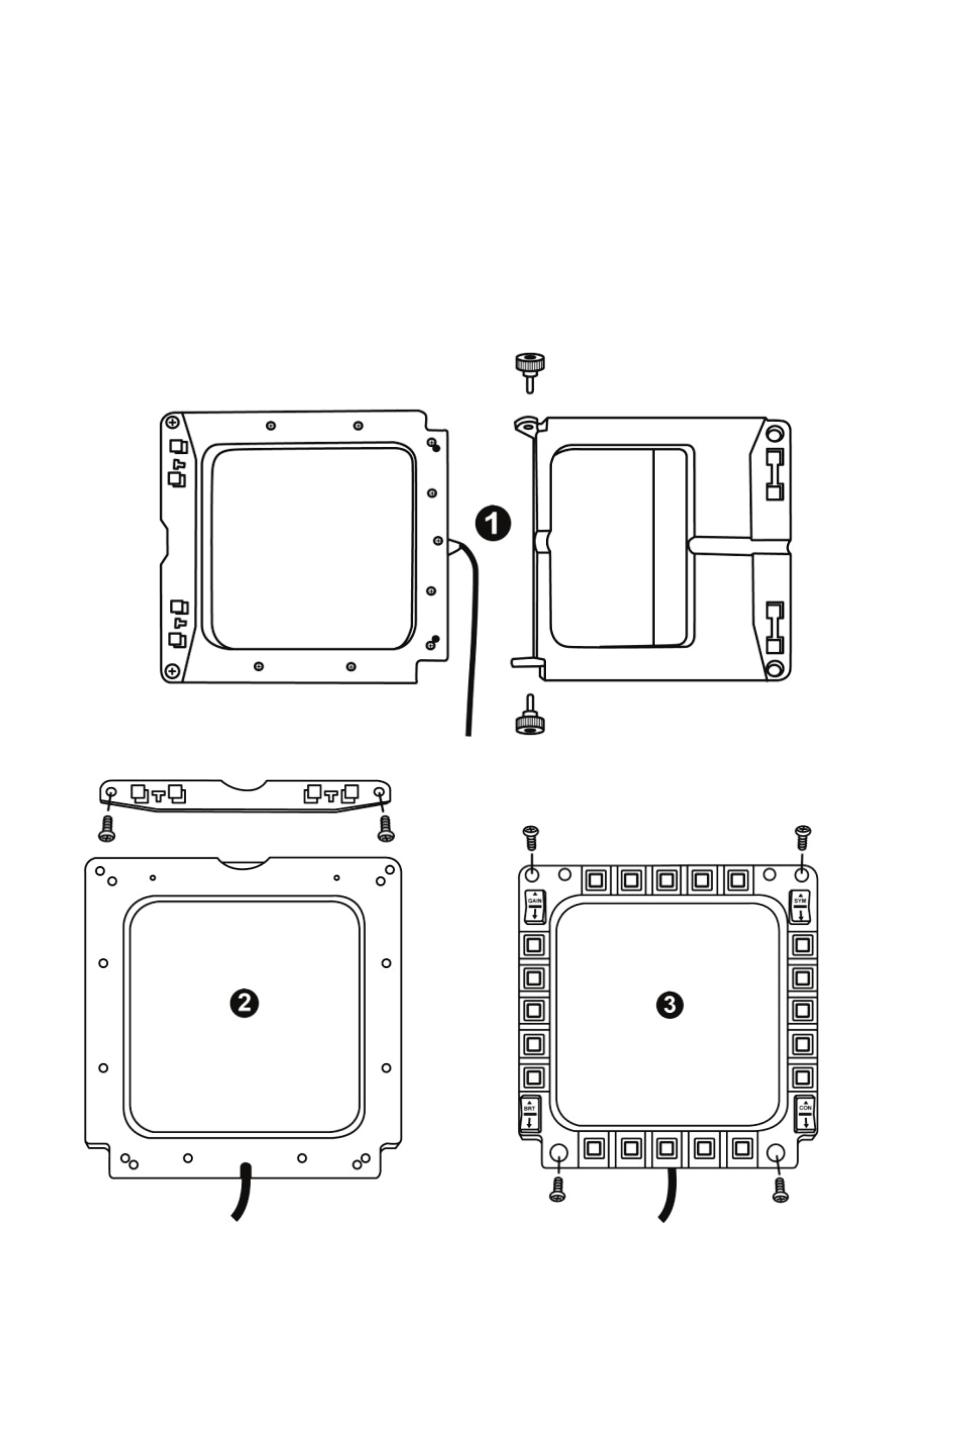 ... display kongsberg seatex as Array - thrustmaster mfd cougar pack user  manual page 43 145 rh manualsdir com